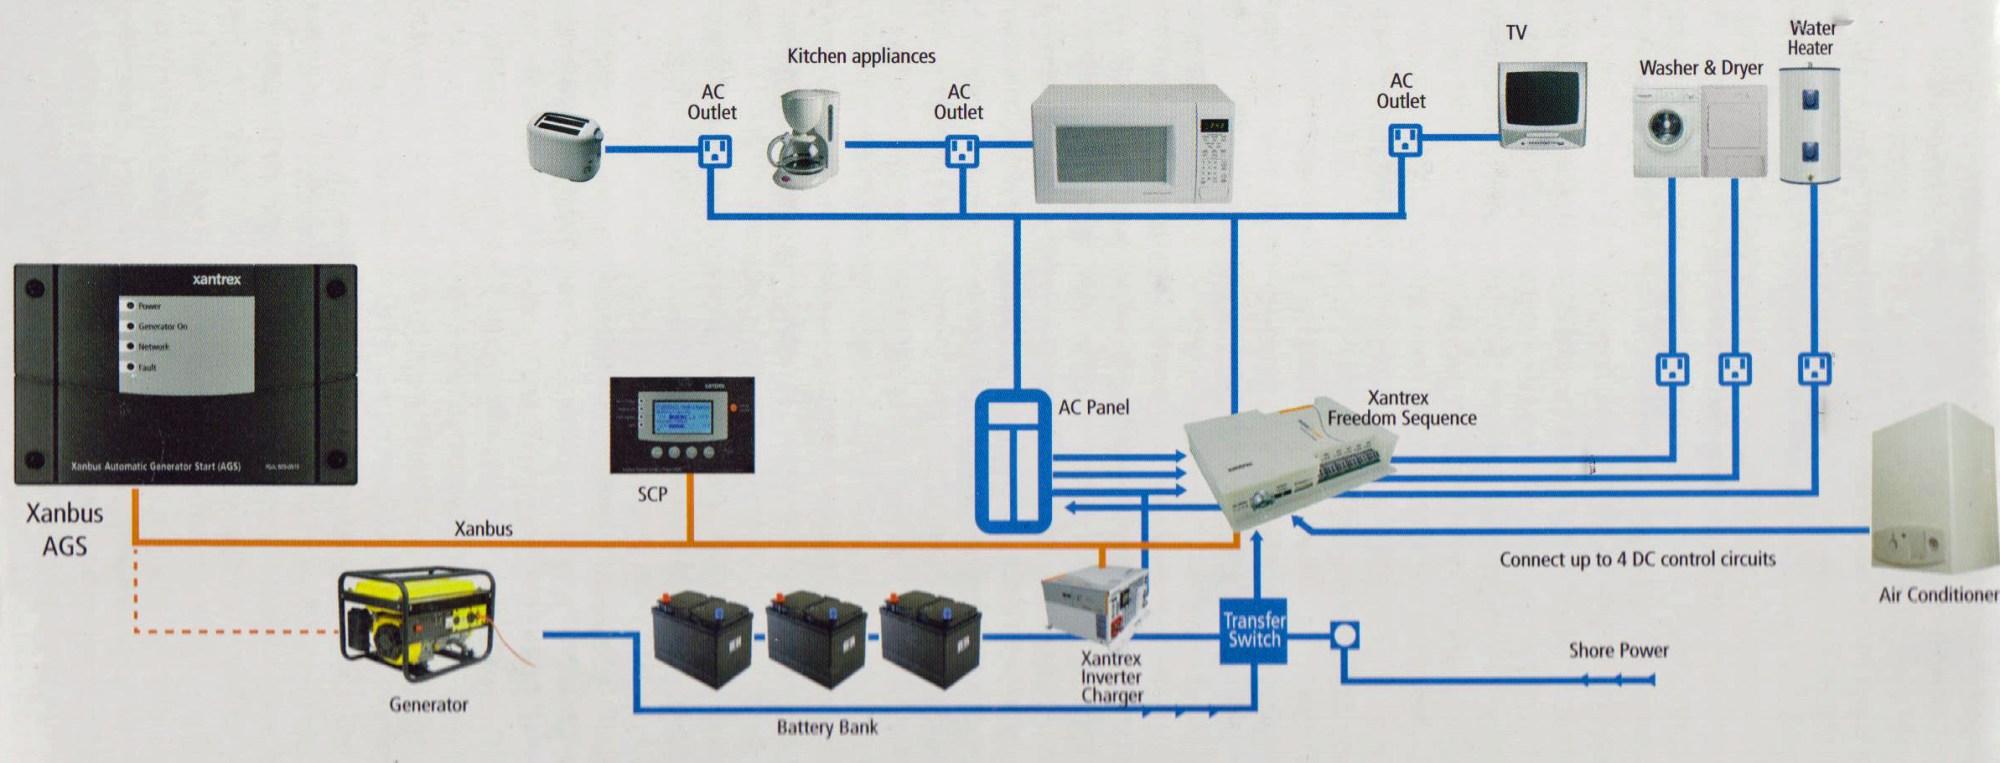 hight resolution of xantrex wiring diagram wiring diagrams wni xantrex wiring diagram xantrex wiring diagram